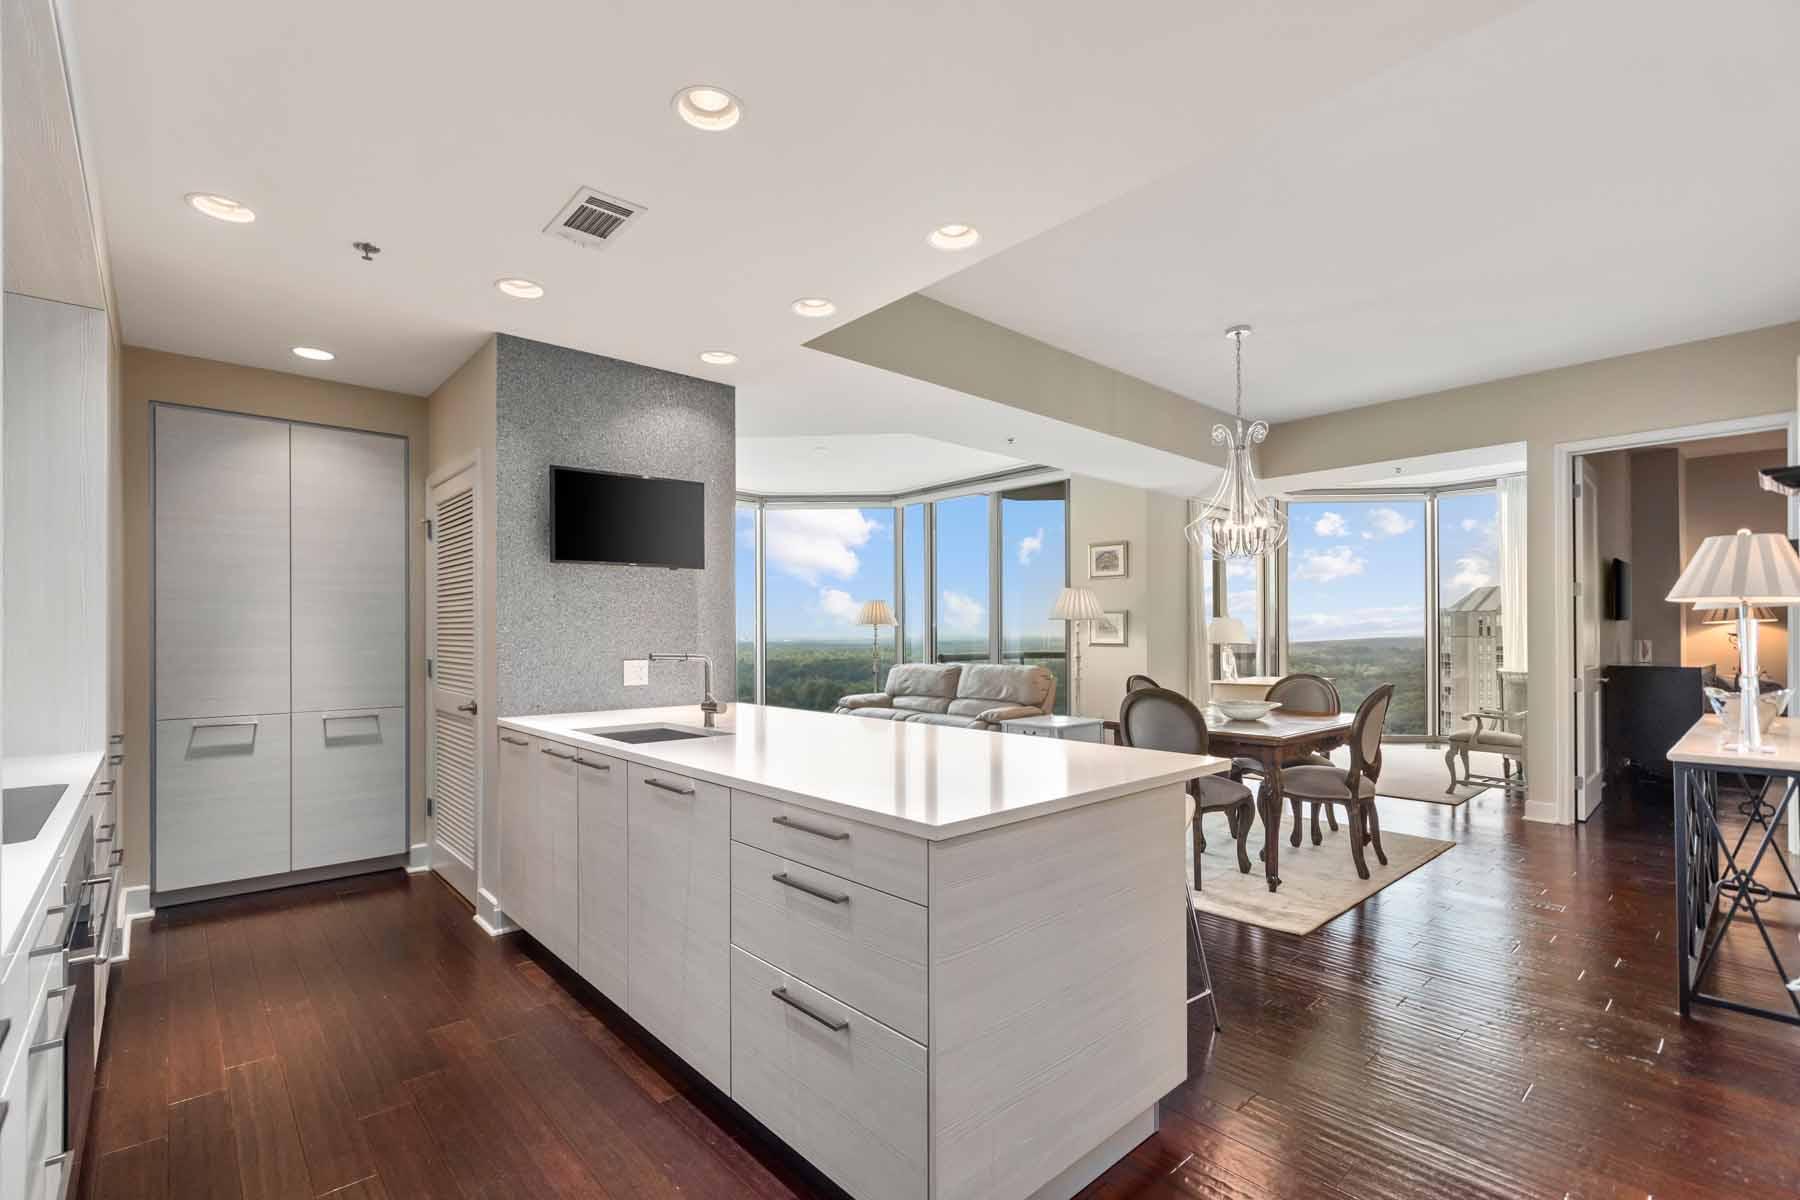 Condominiums для того Продажа на Exceptional Quality Buckhead Masterpiece 2795 Peachtree Road NE No. 2301, Atlanta, Джорджия 30305 Соединенные Штаты